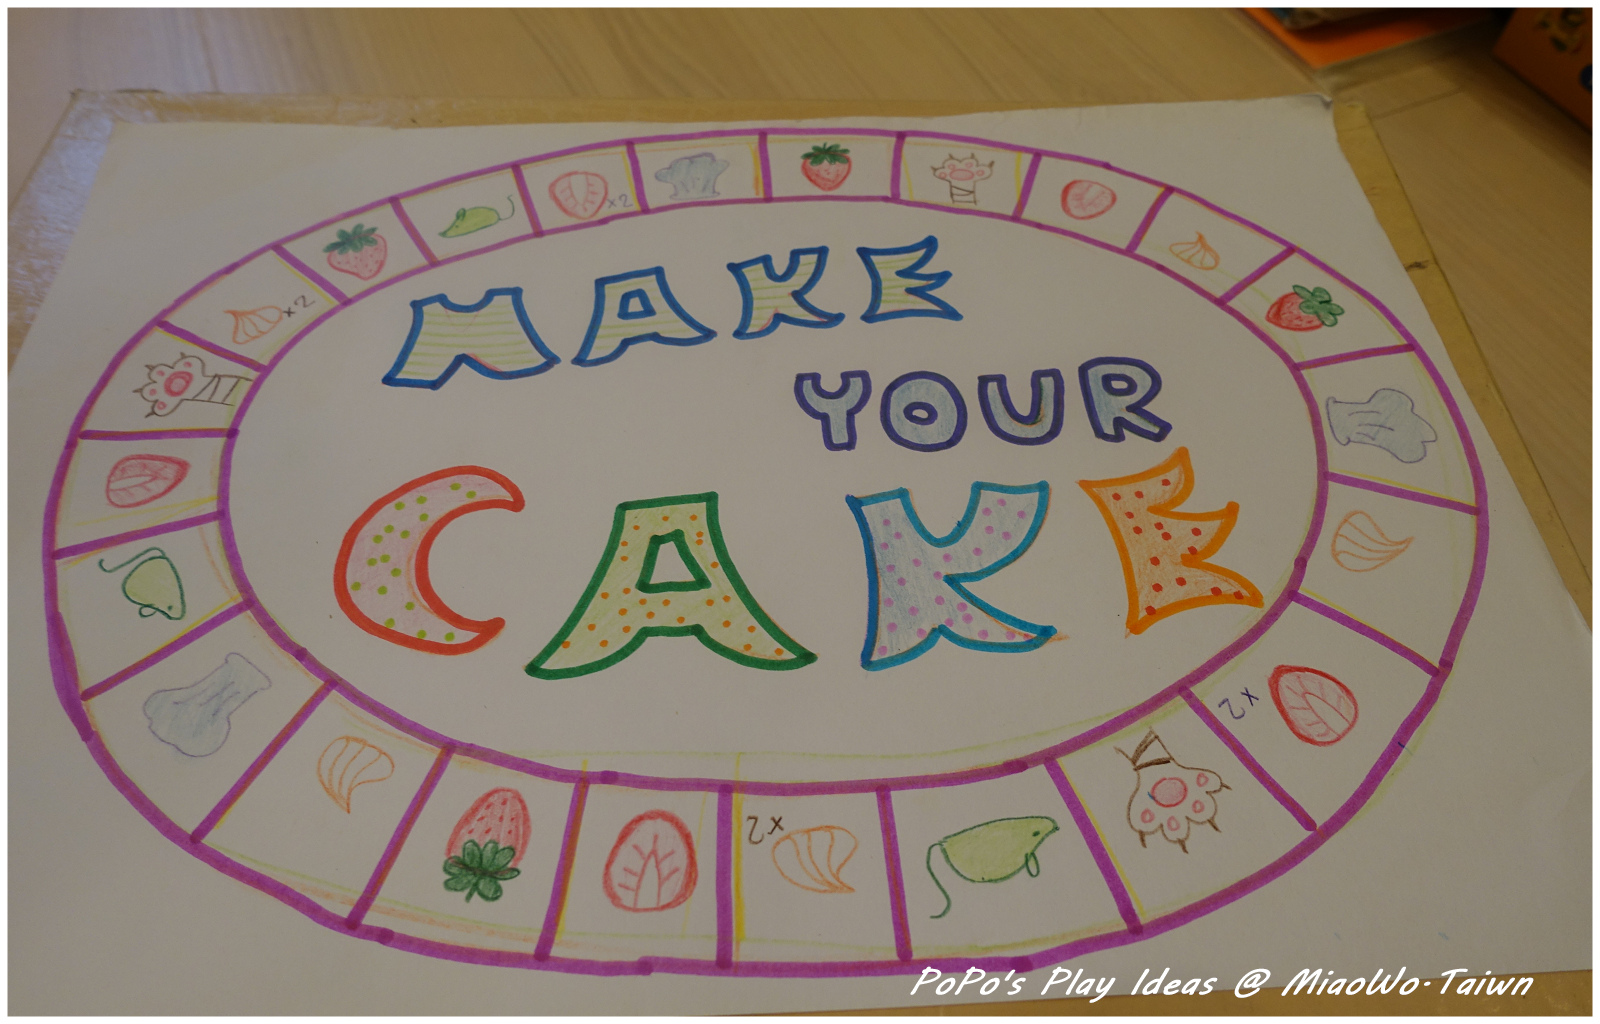 Make your cake-01.jpg